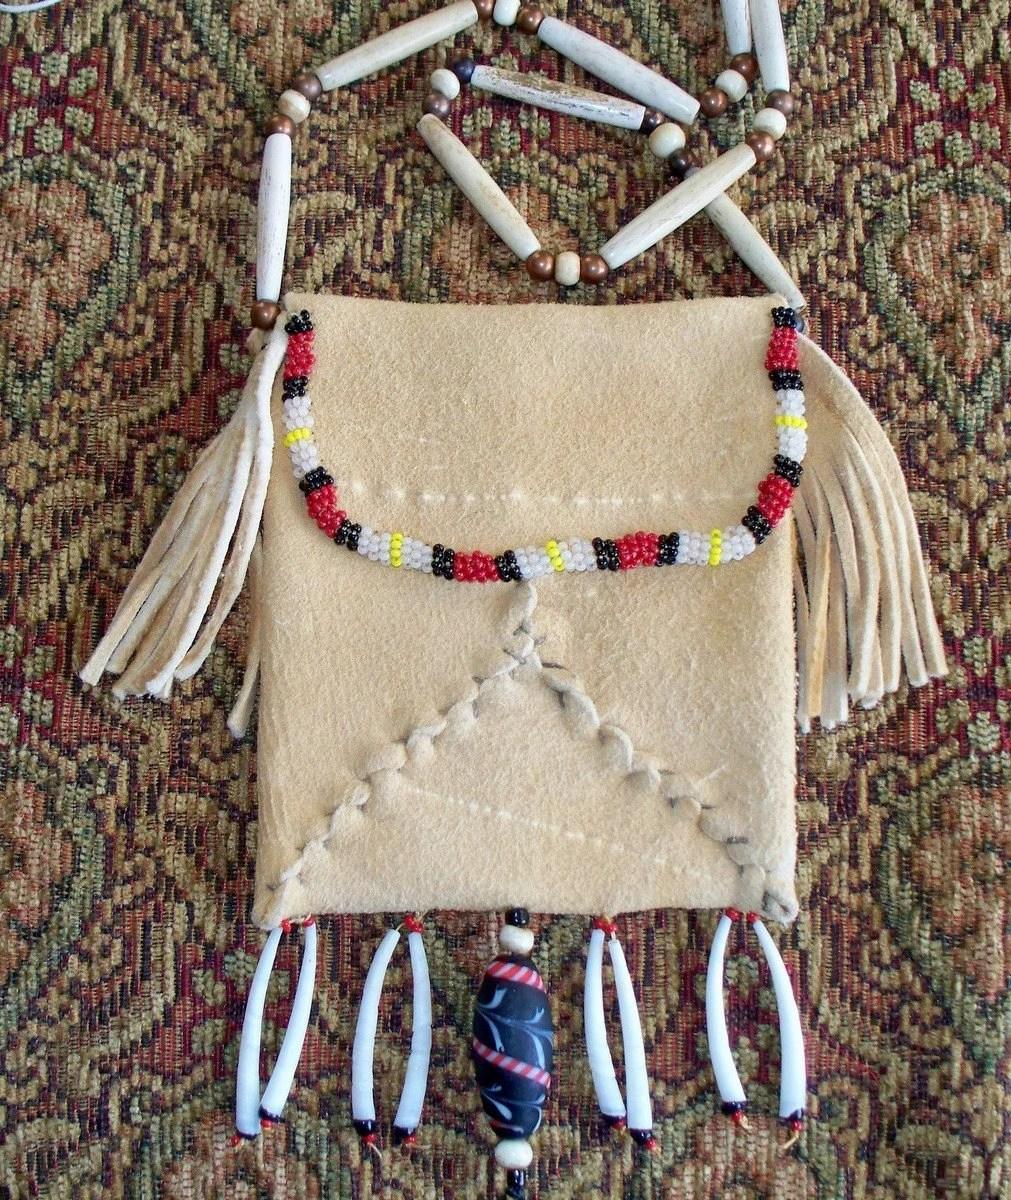 Beaded Brain Tanned Buckskin Amulet or Medicine Bag Dentalium Shell Fringe by Miss Tudy